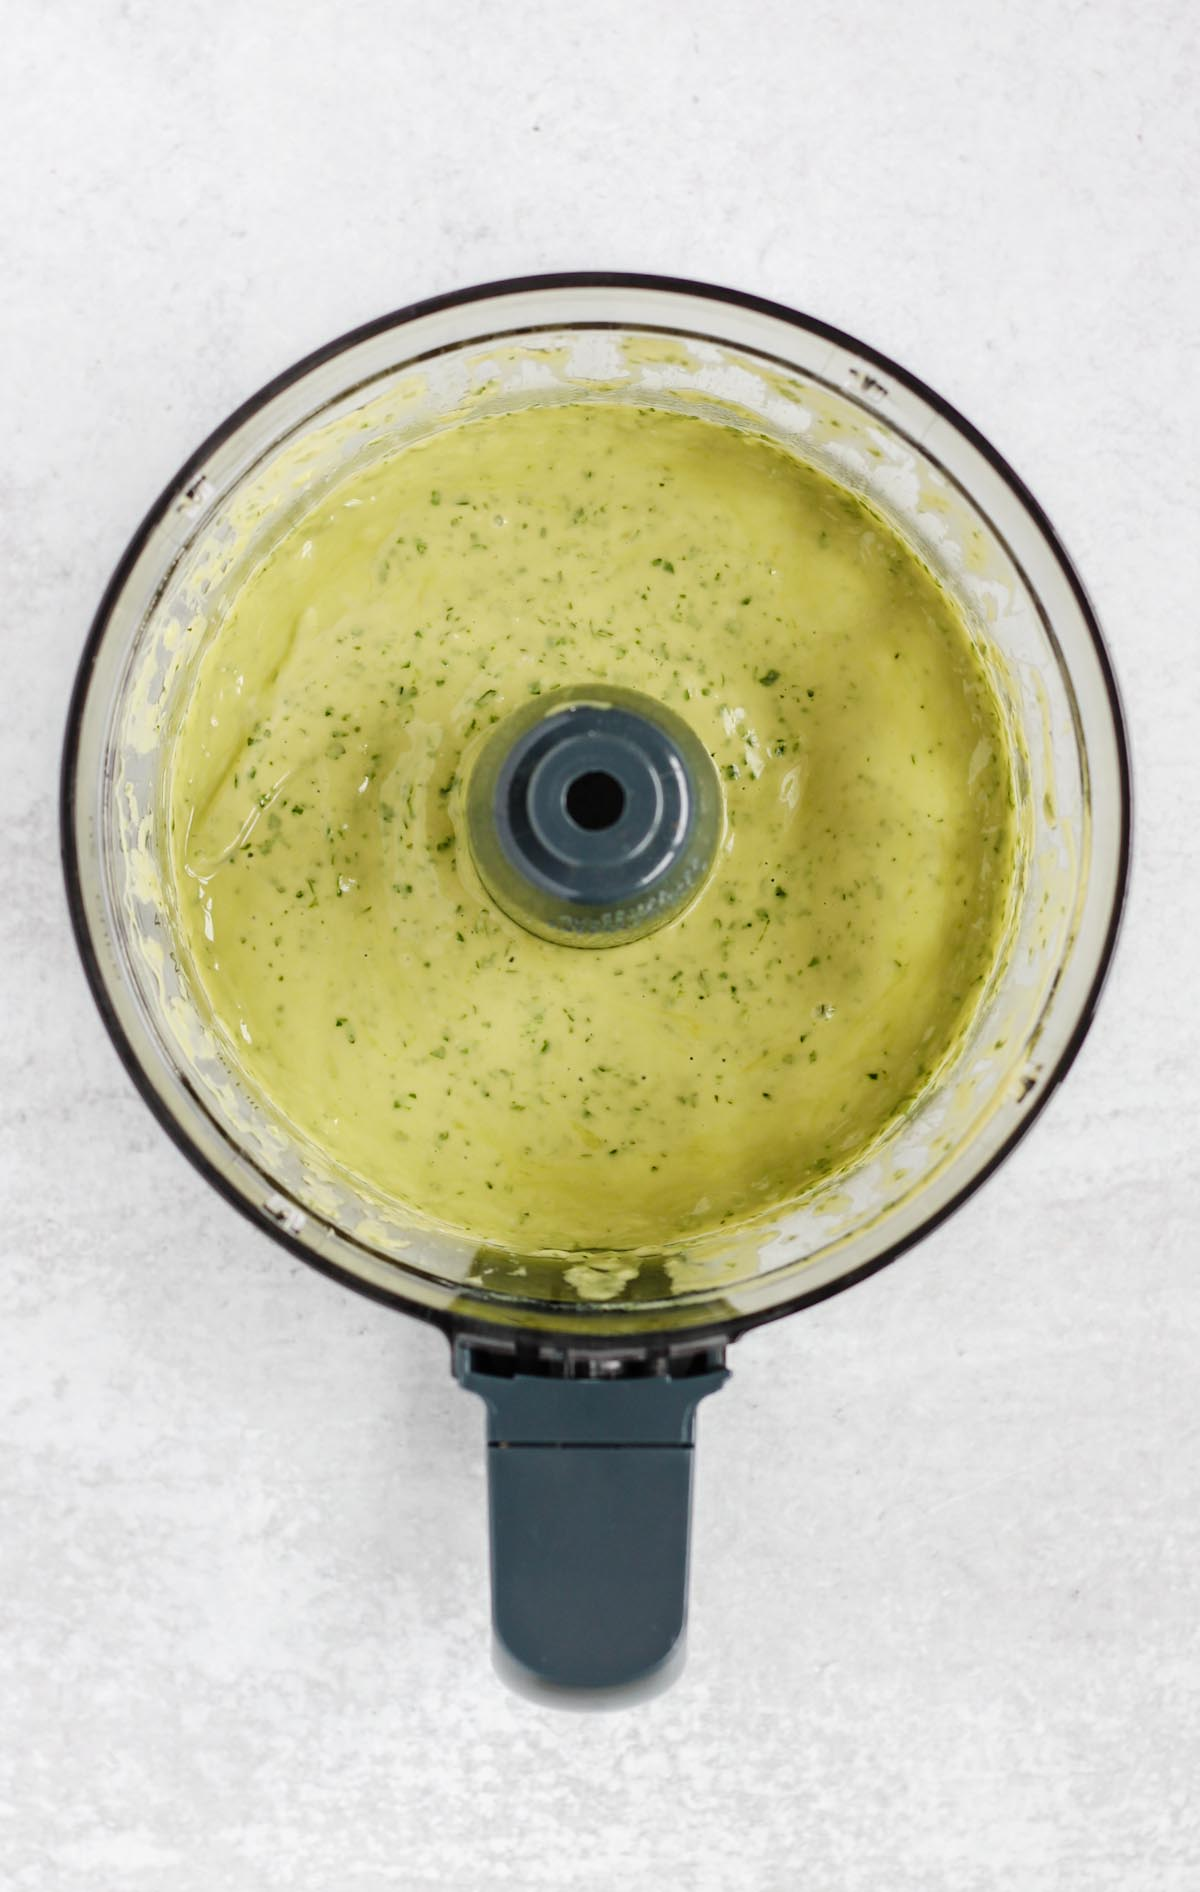 Creamy cilantro lime dressing in a food processor.